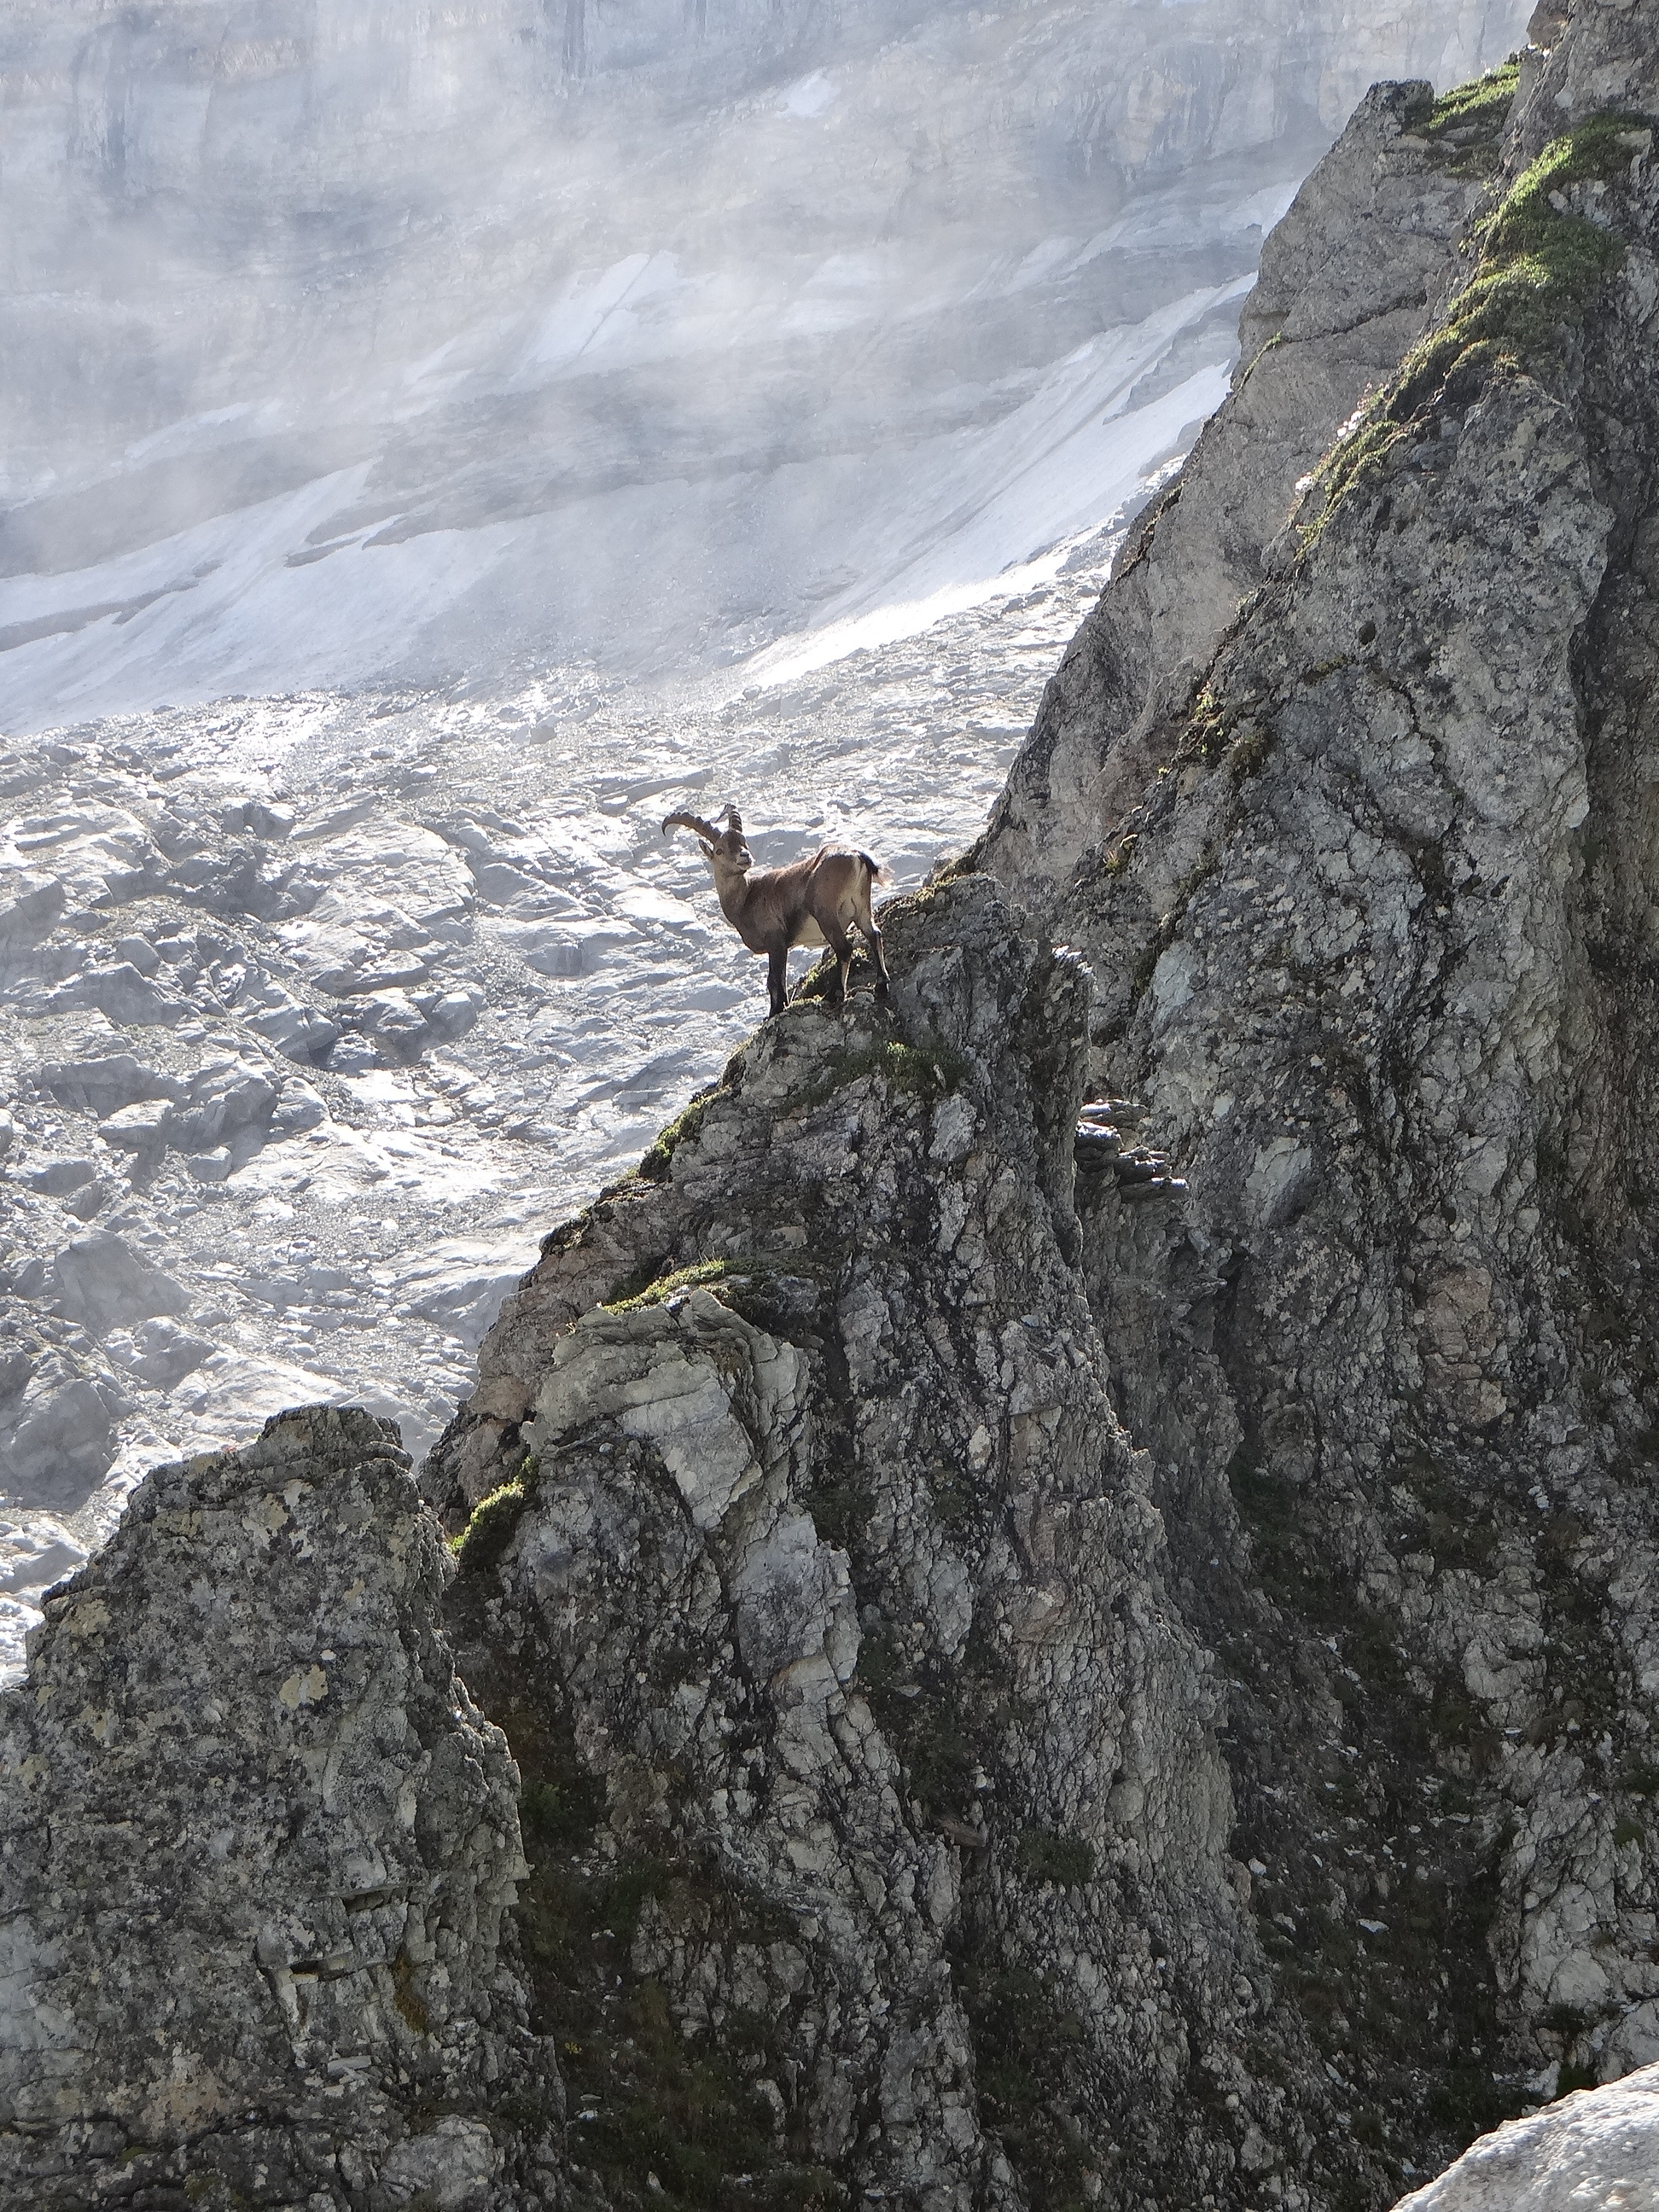 An Ibex, presumably a descendant of the lucky survivor from the Panjshir folktale. (Wikimedia)